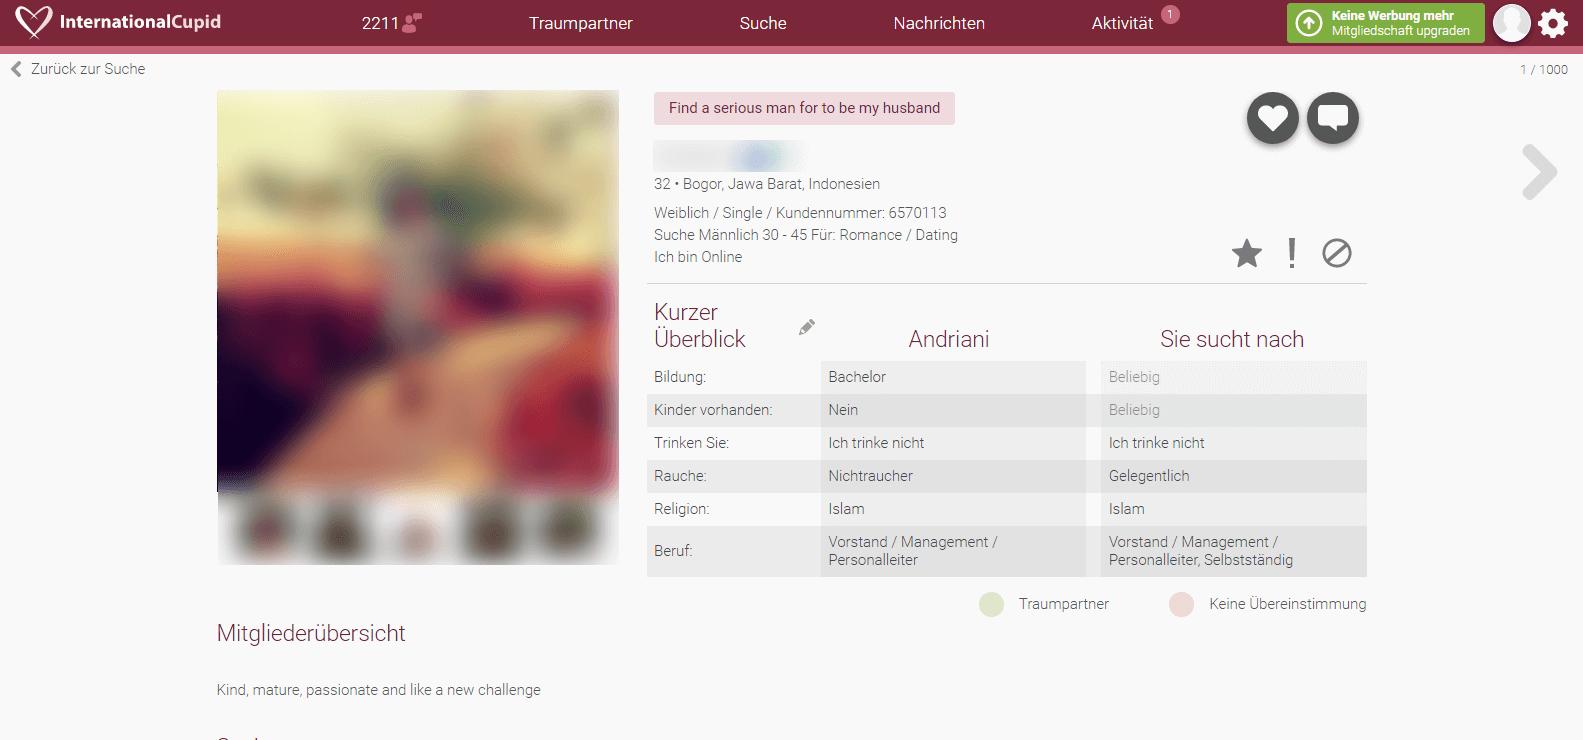 InternationalCupid Profil